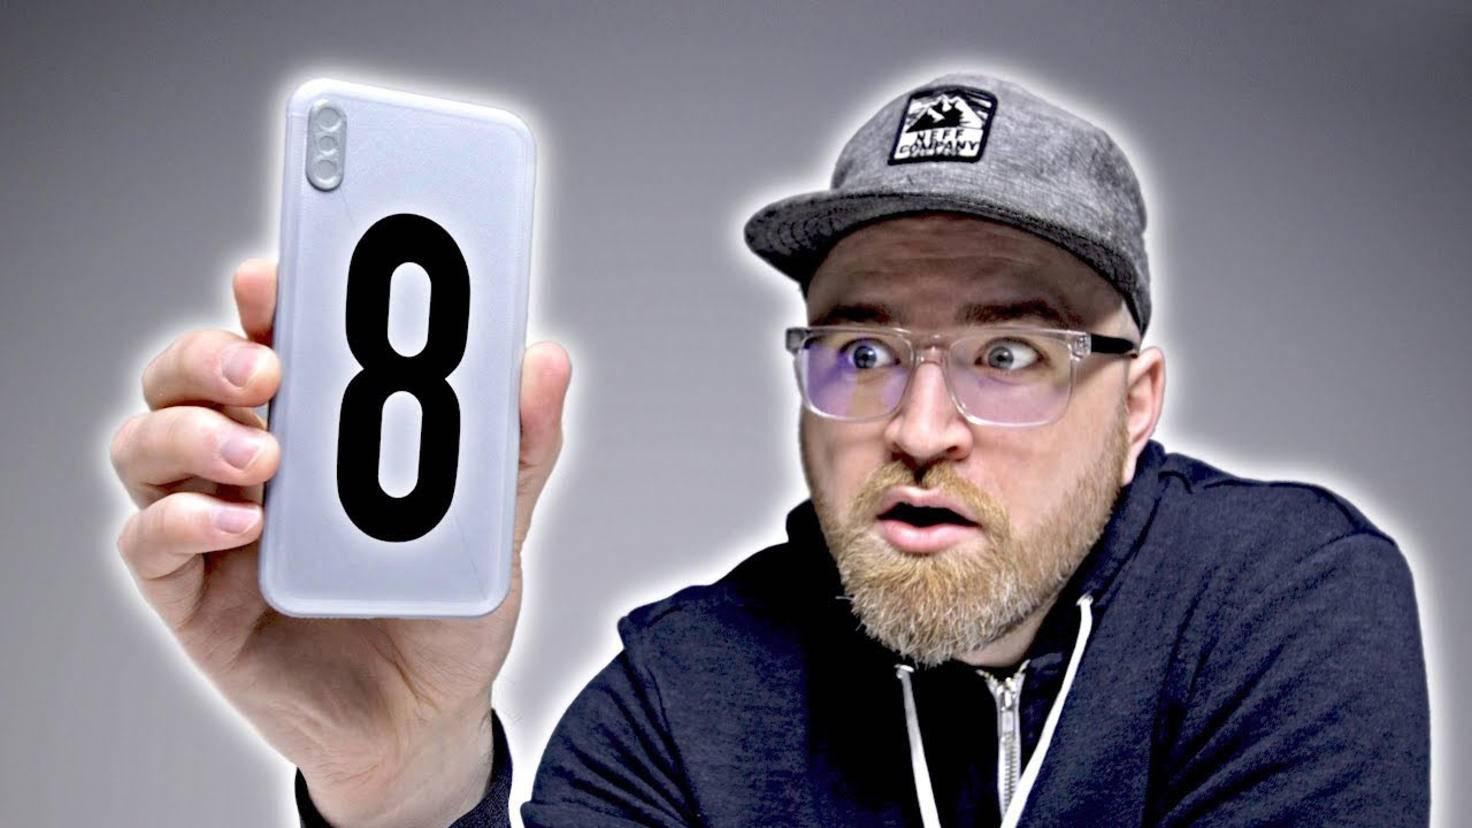 iPhone-8-mockup